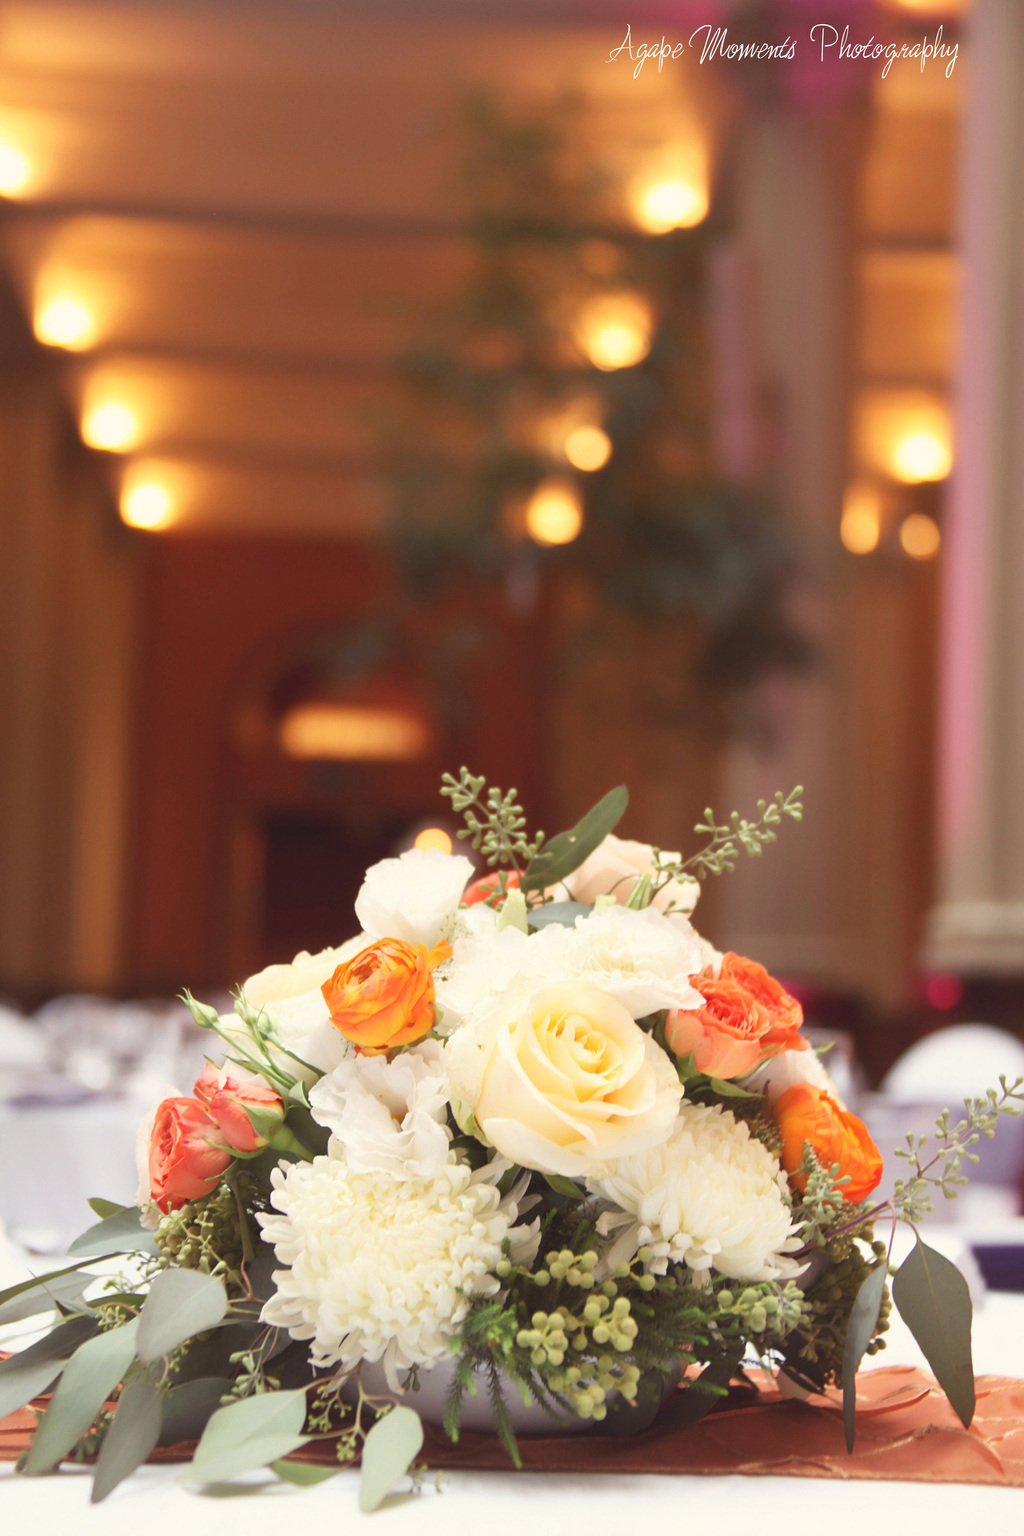 Becca%20britt-wedding%201-0372%20copy.full